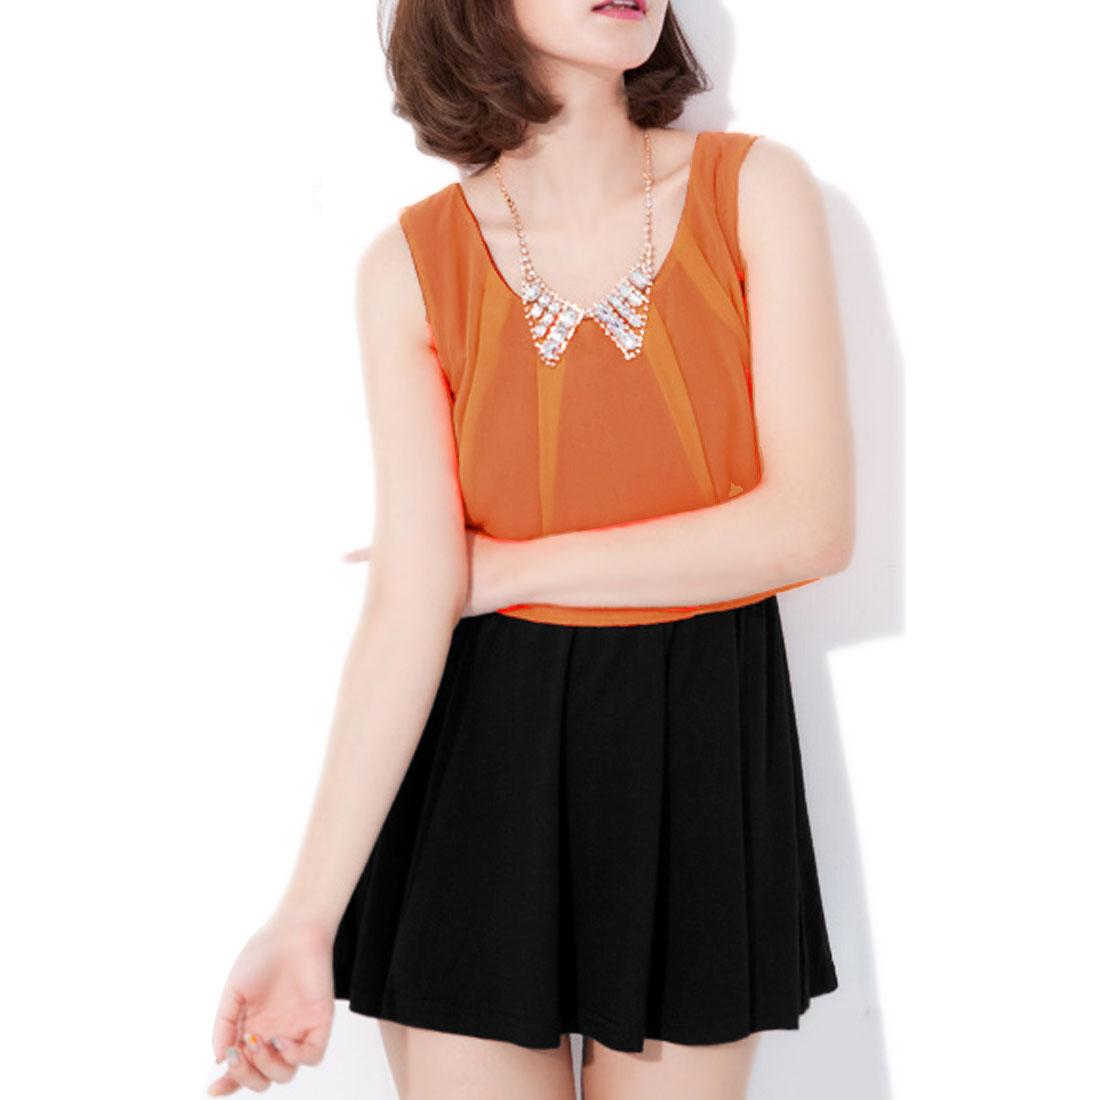 Ladies Above Knee Spliced Chiffon Round Neck Dress Light Orange S